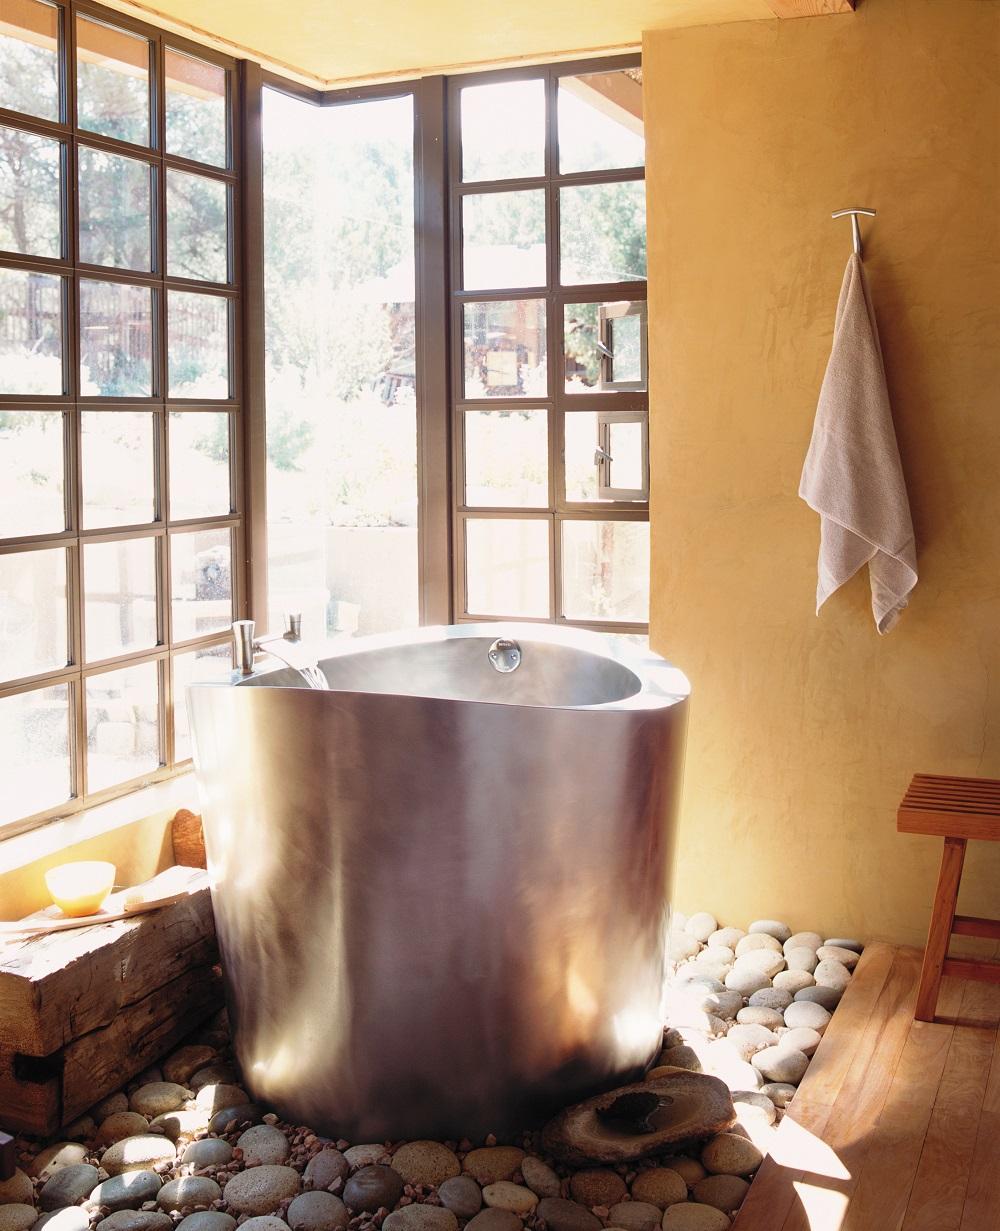 Japanese Soaking Tub For Small Bathroom Ofuro Soaking Tubs The Vibe Of Japan In Your Bathroom Decorideasbathroom Com Best Bath Ideas